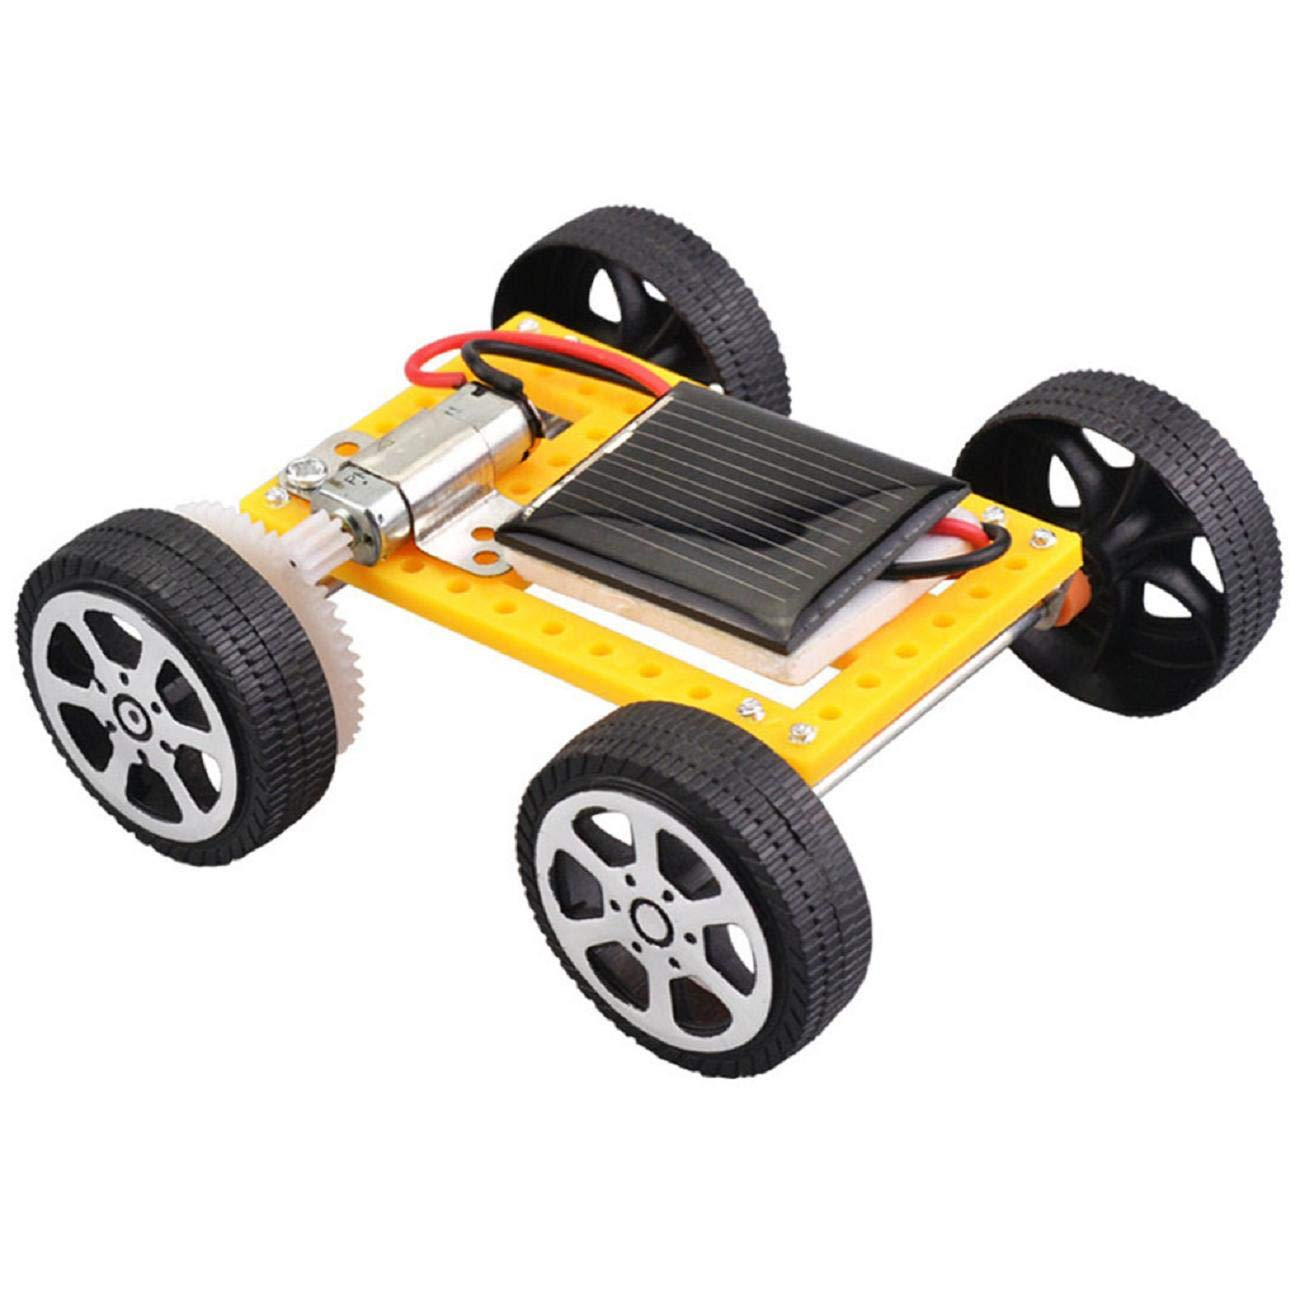 Children Toys Dartphew Solar Car DIY Assemble Toy Set Solar Powered Car Kit Educational Science for Kid Birthday Great Gift for Kids Baby Boys Girls